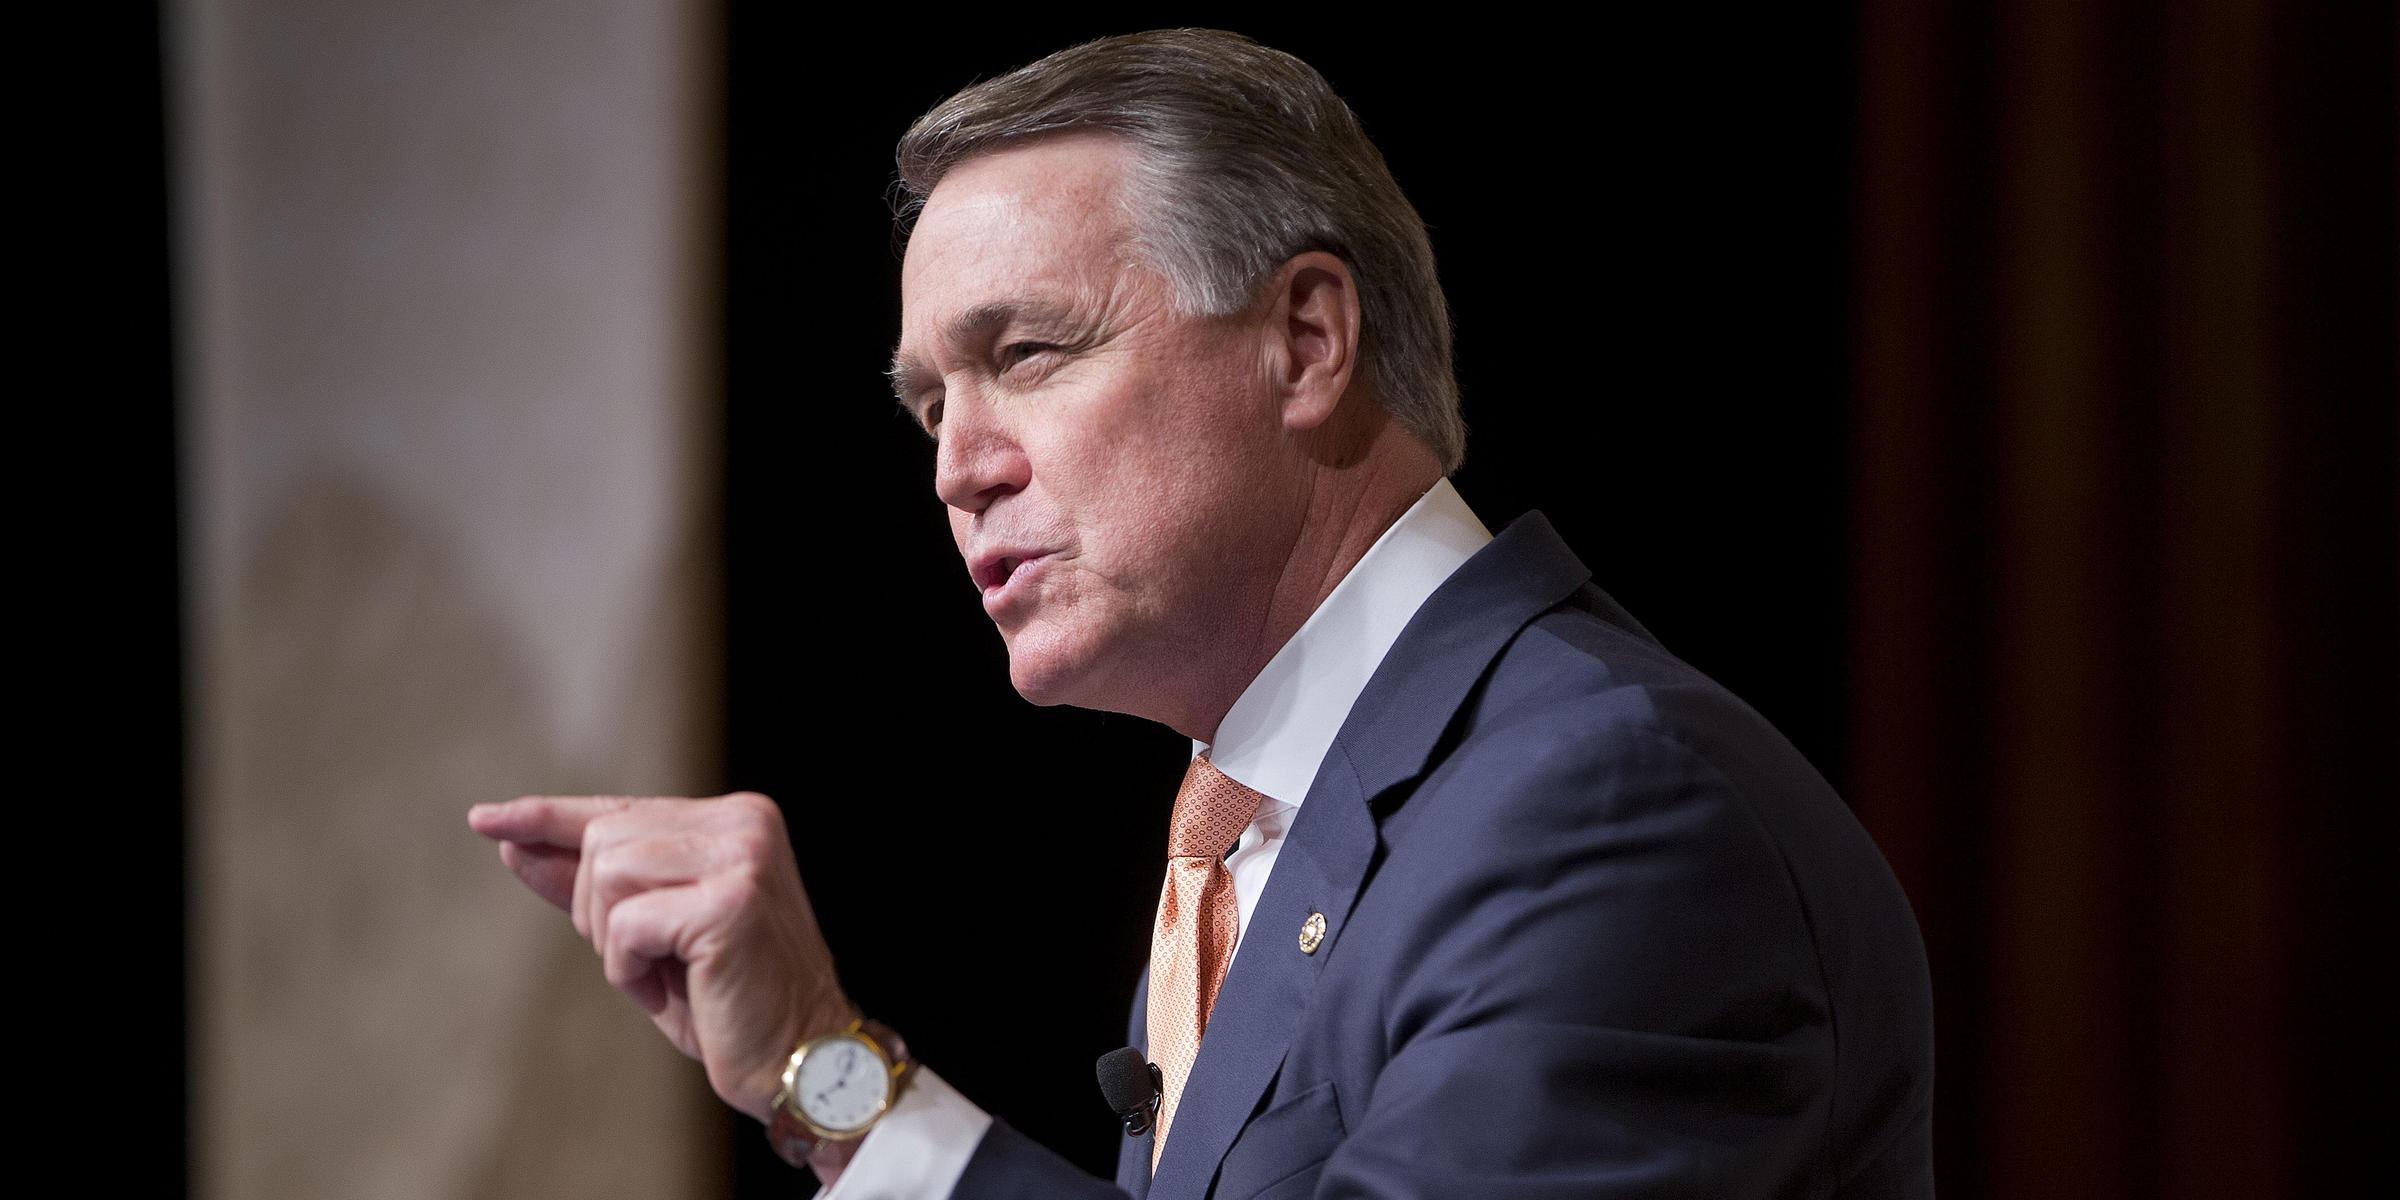 http://news.wabe.org/post/sen-david-perdue-talks-russian-election-hack-rex-tillerson